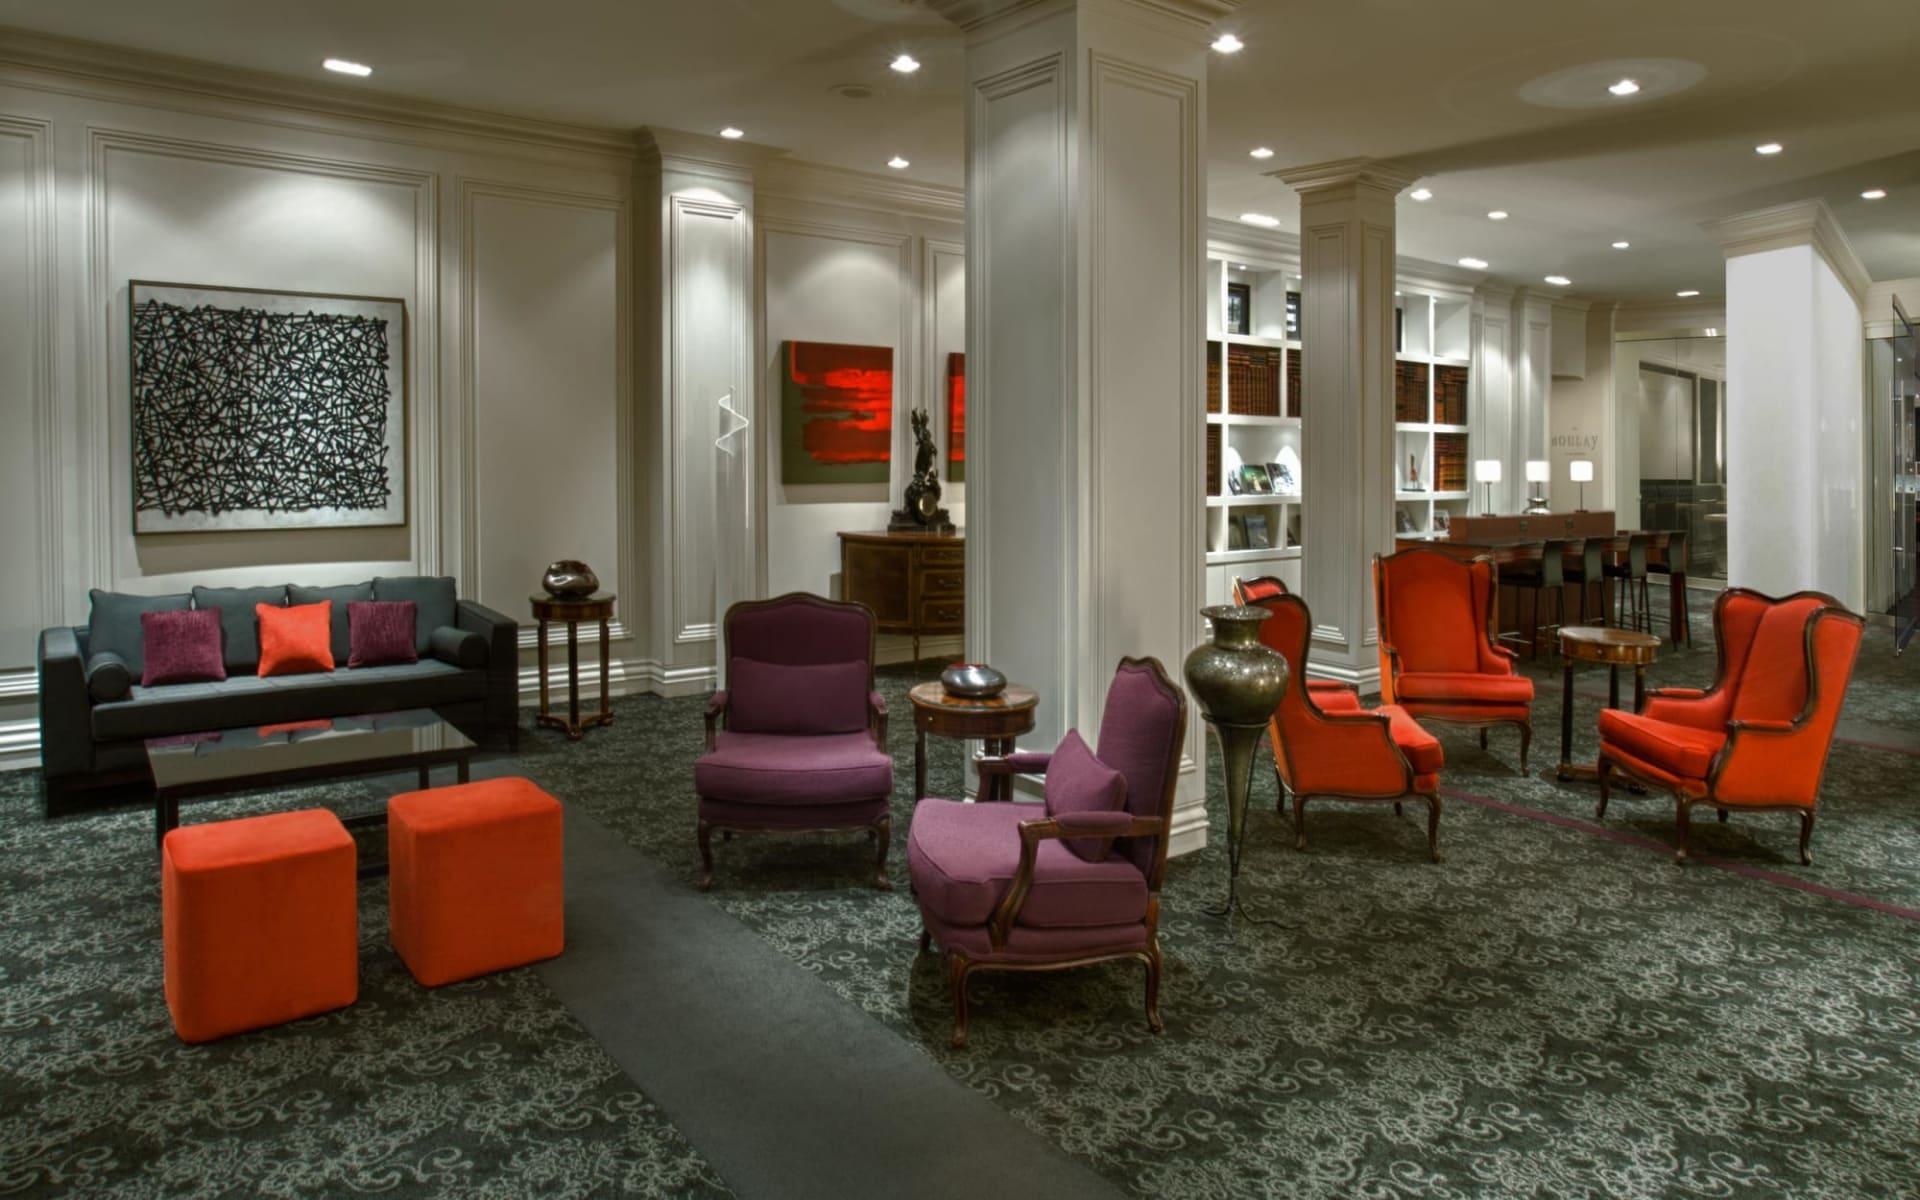 Hotel Manoir Victoria in Québec City:  Manoir Victoria_Lobby